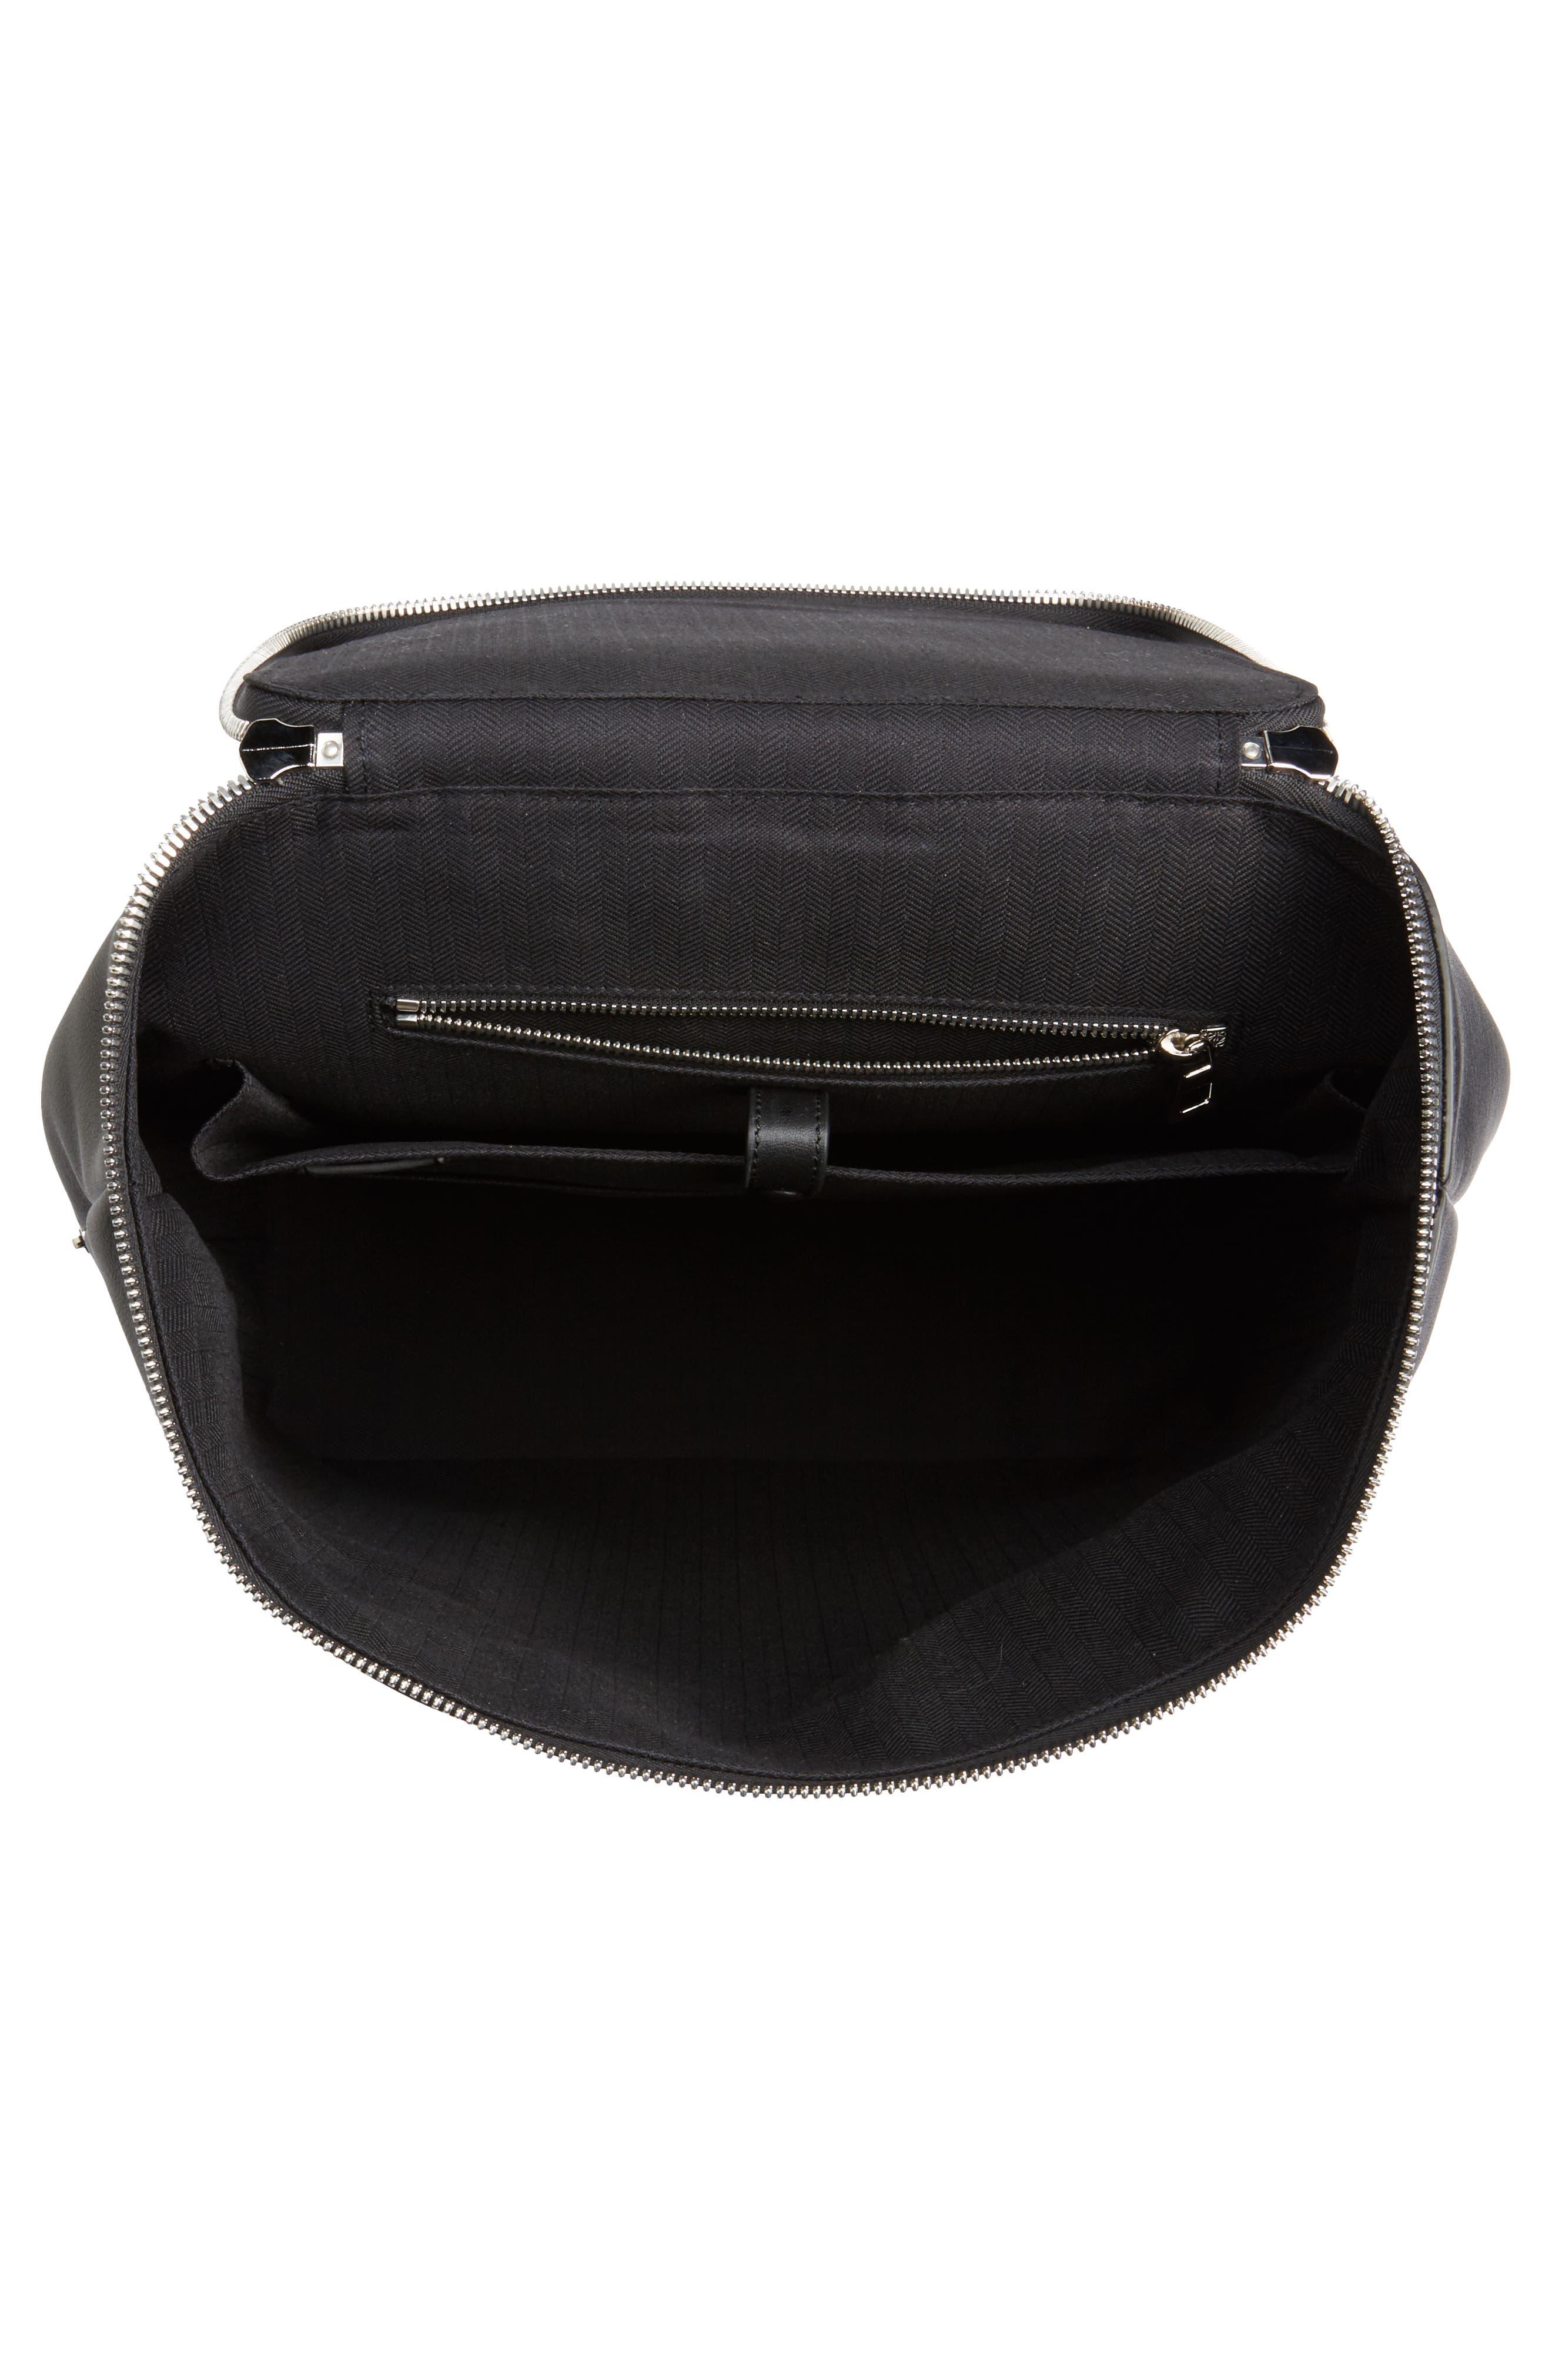 LOEWE, Goya Leather Backpack, Alternate thumbnail 4, color, BLACK